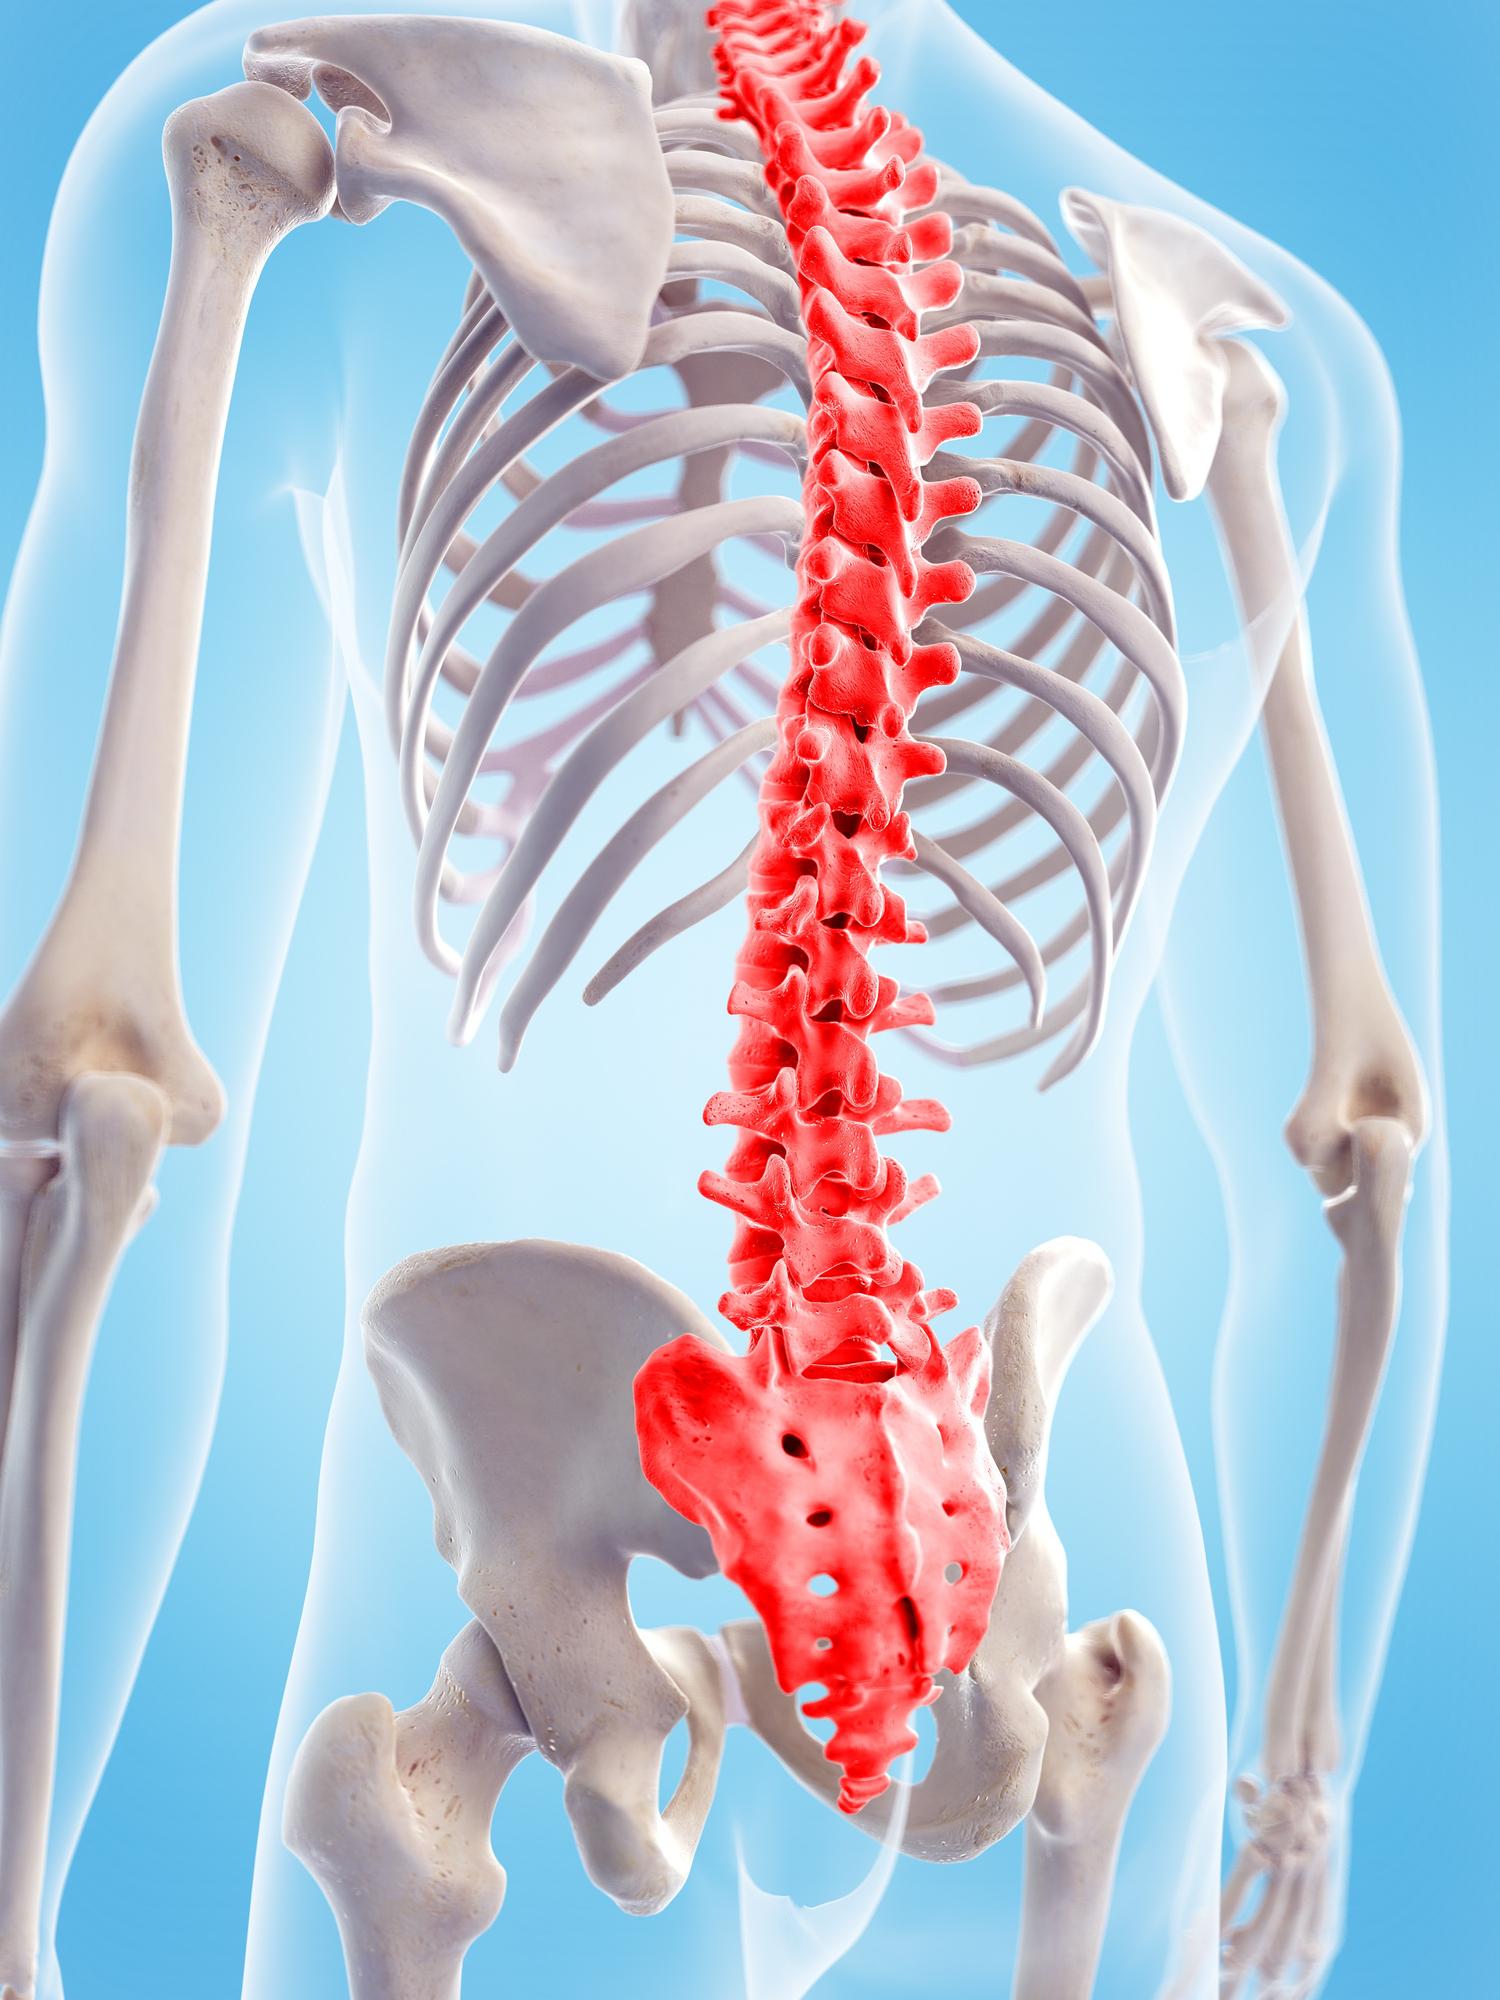 Human spinal pain, illustration